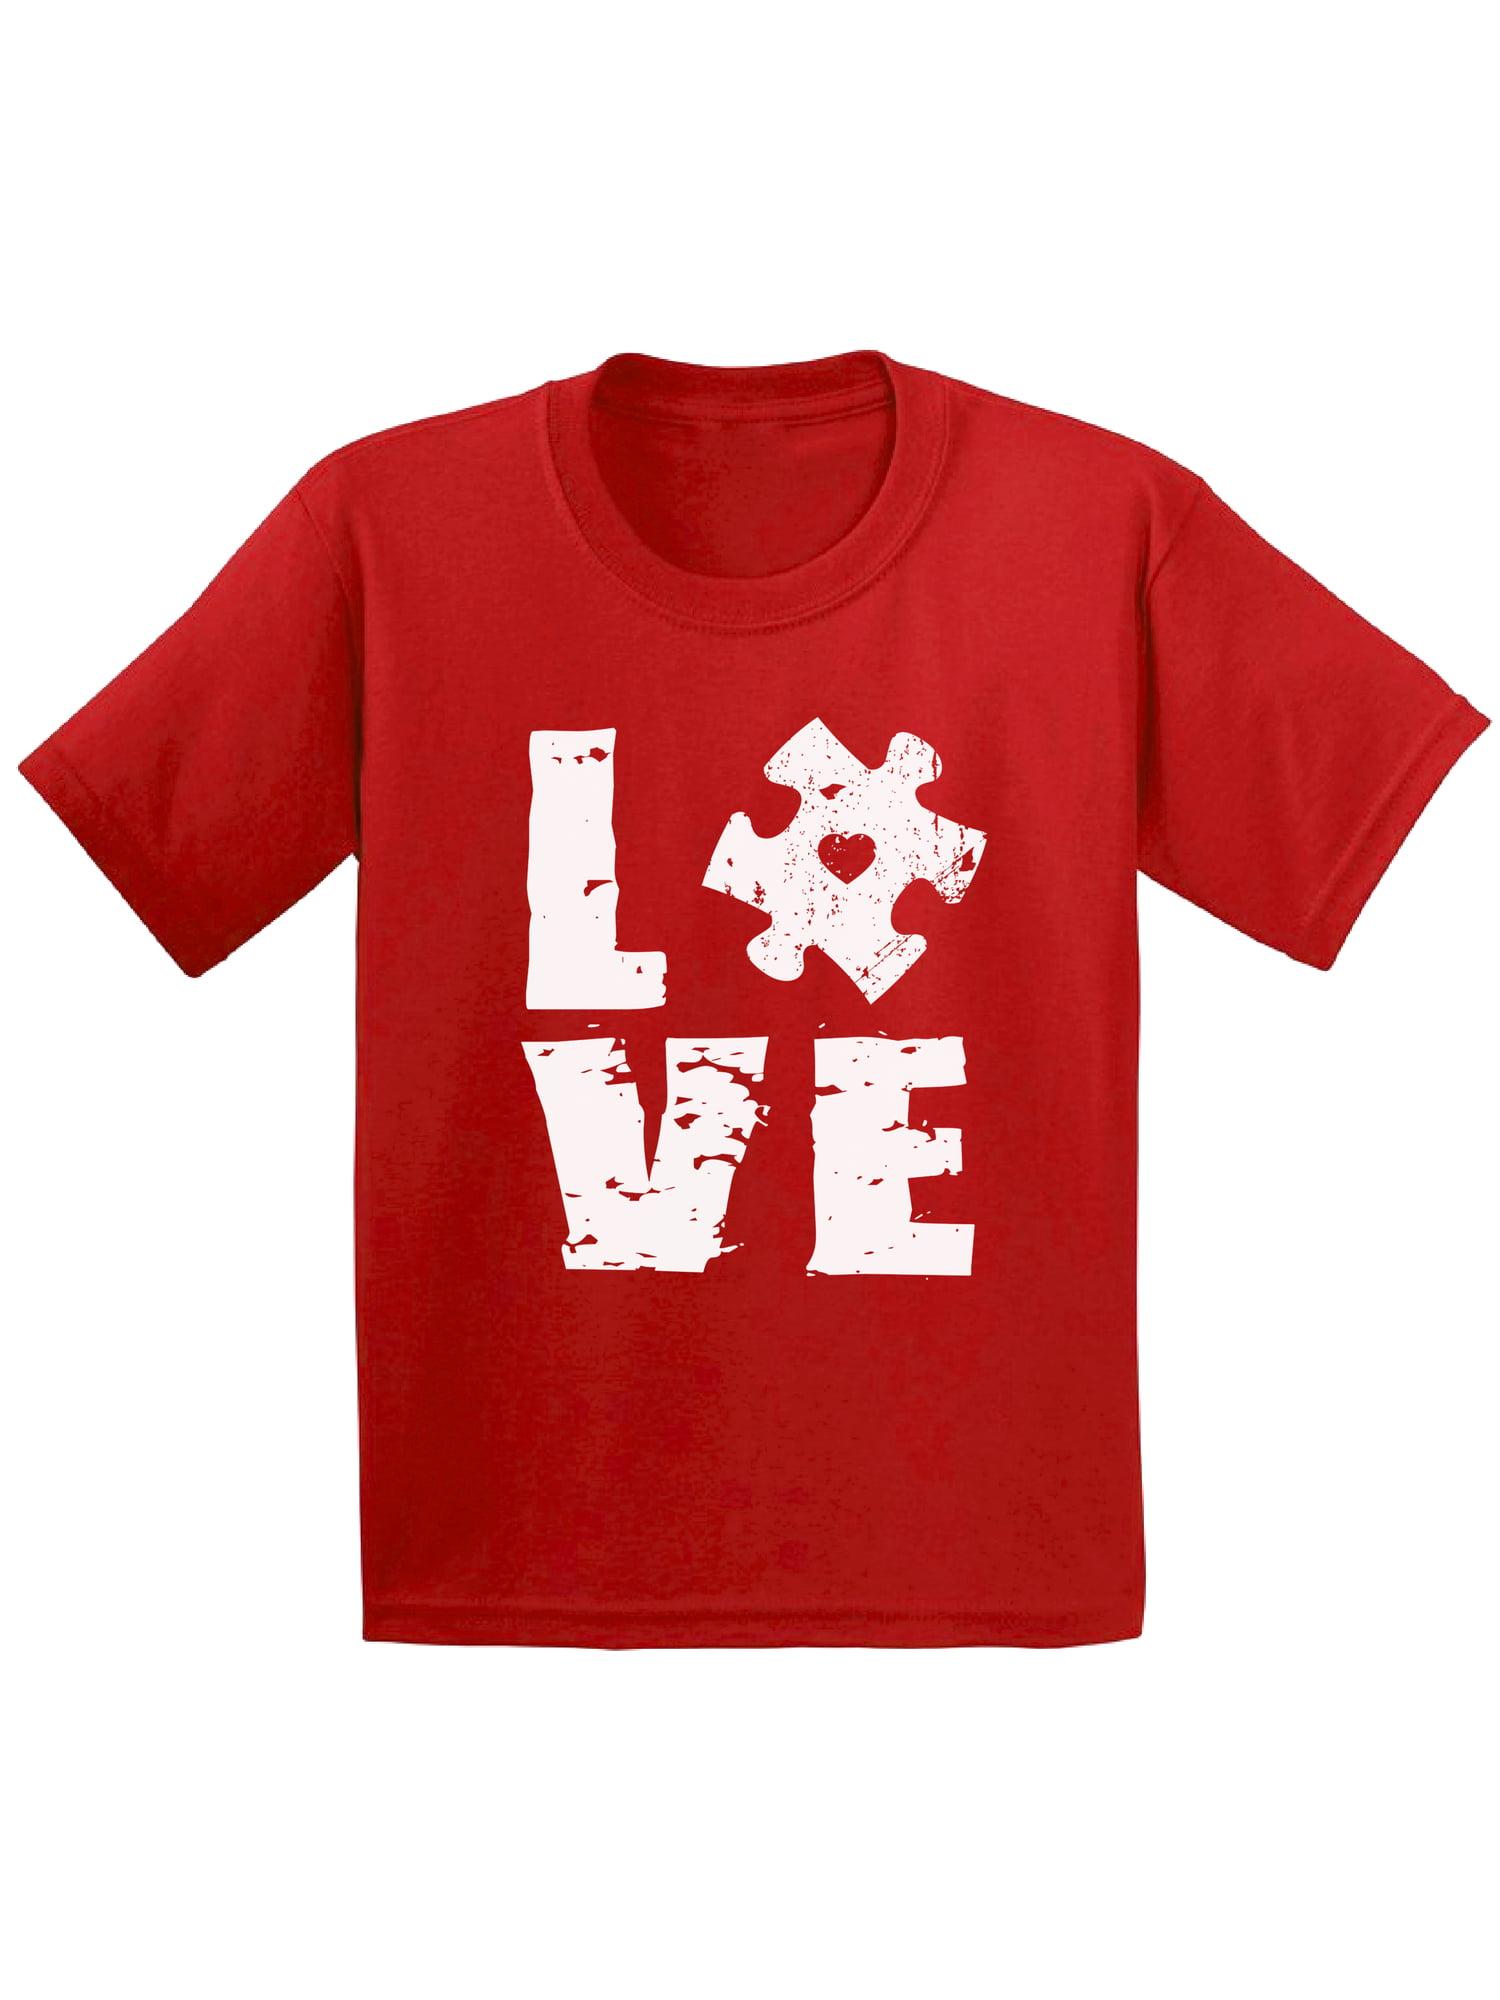 Awkward Styles Love Puzzle Toddler Shirt Autism Awareness Shirts for Kids Autism Love Puzzle T Shirt Autism Awareness Puzzle Tshirts for Kids Autism Toddler Shirts Autism Gifts for Boys and Girls